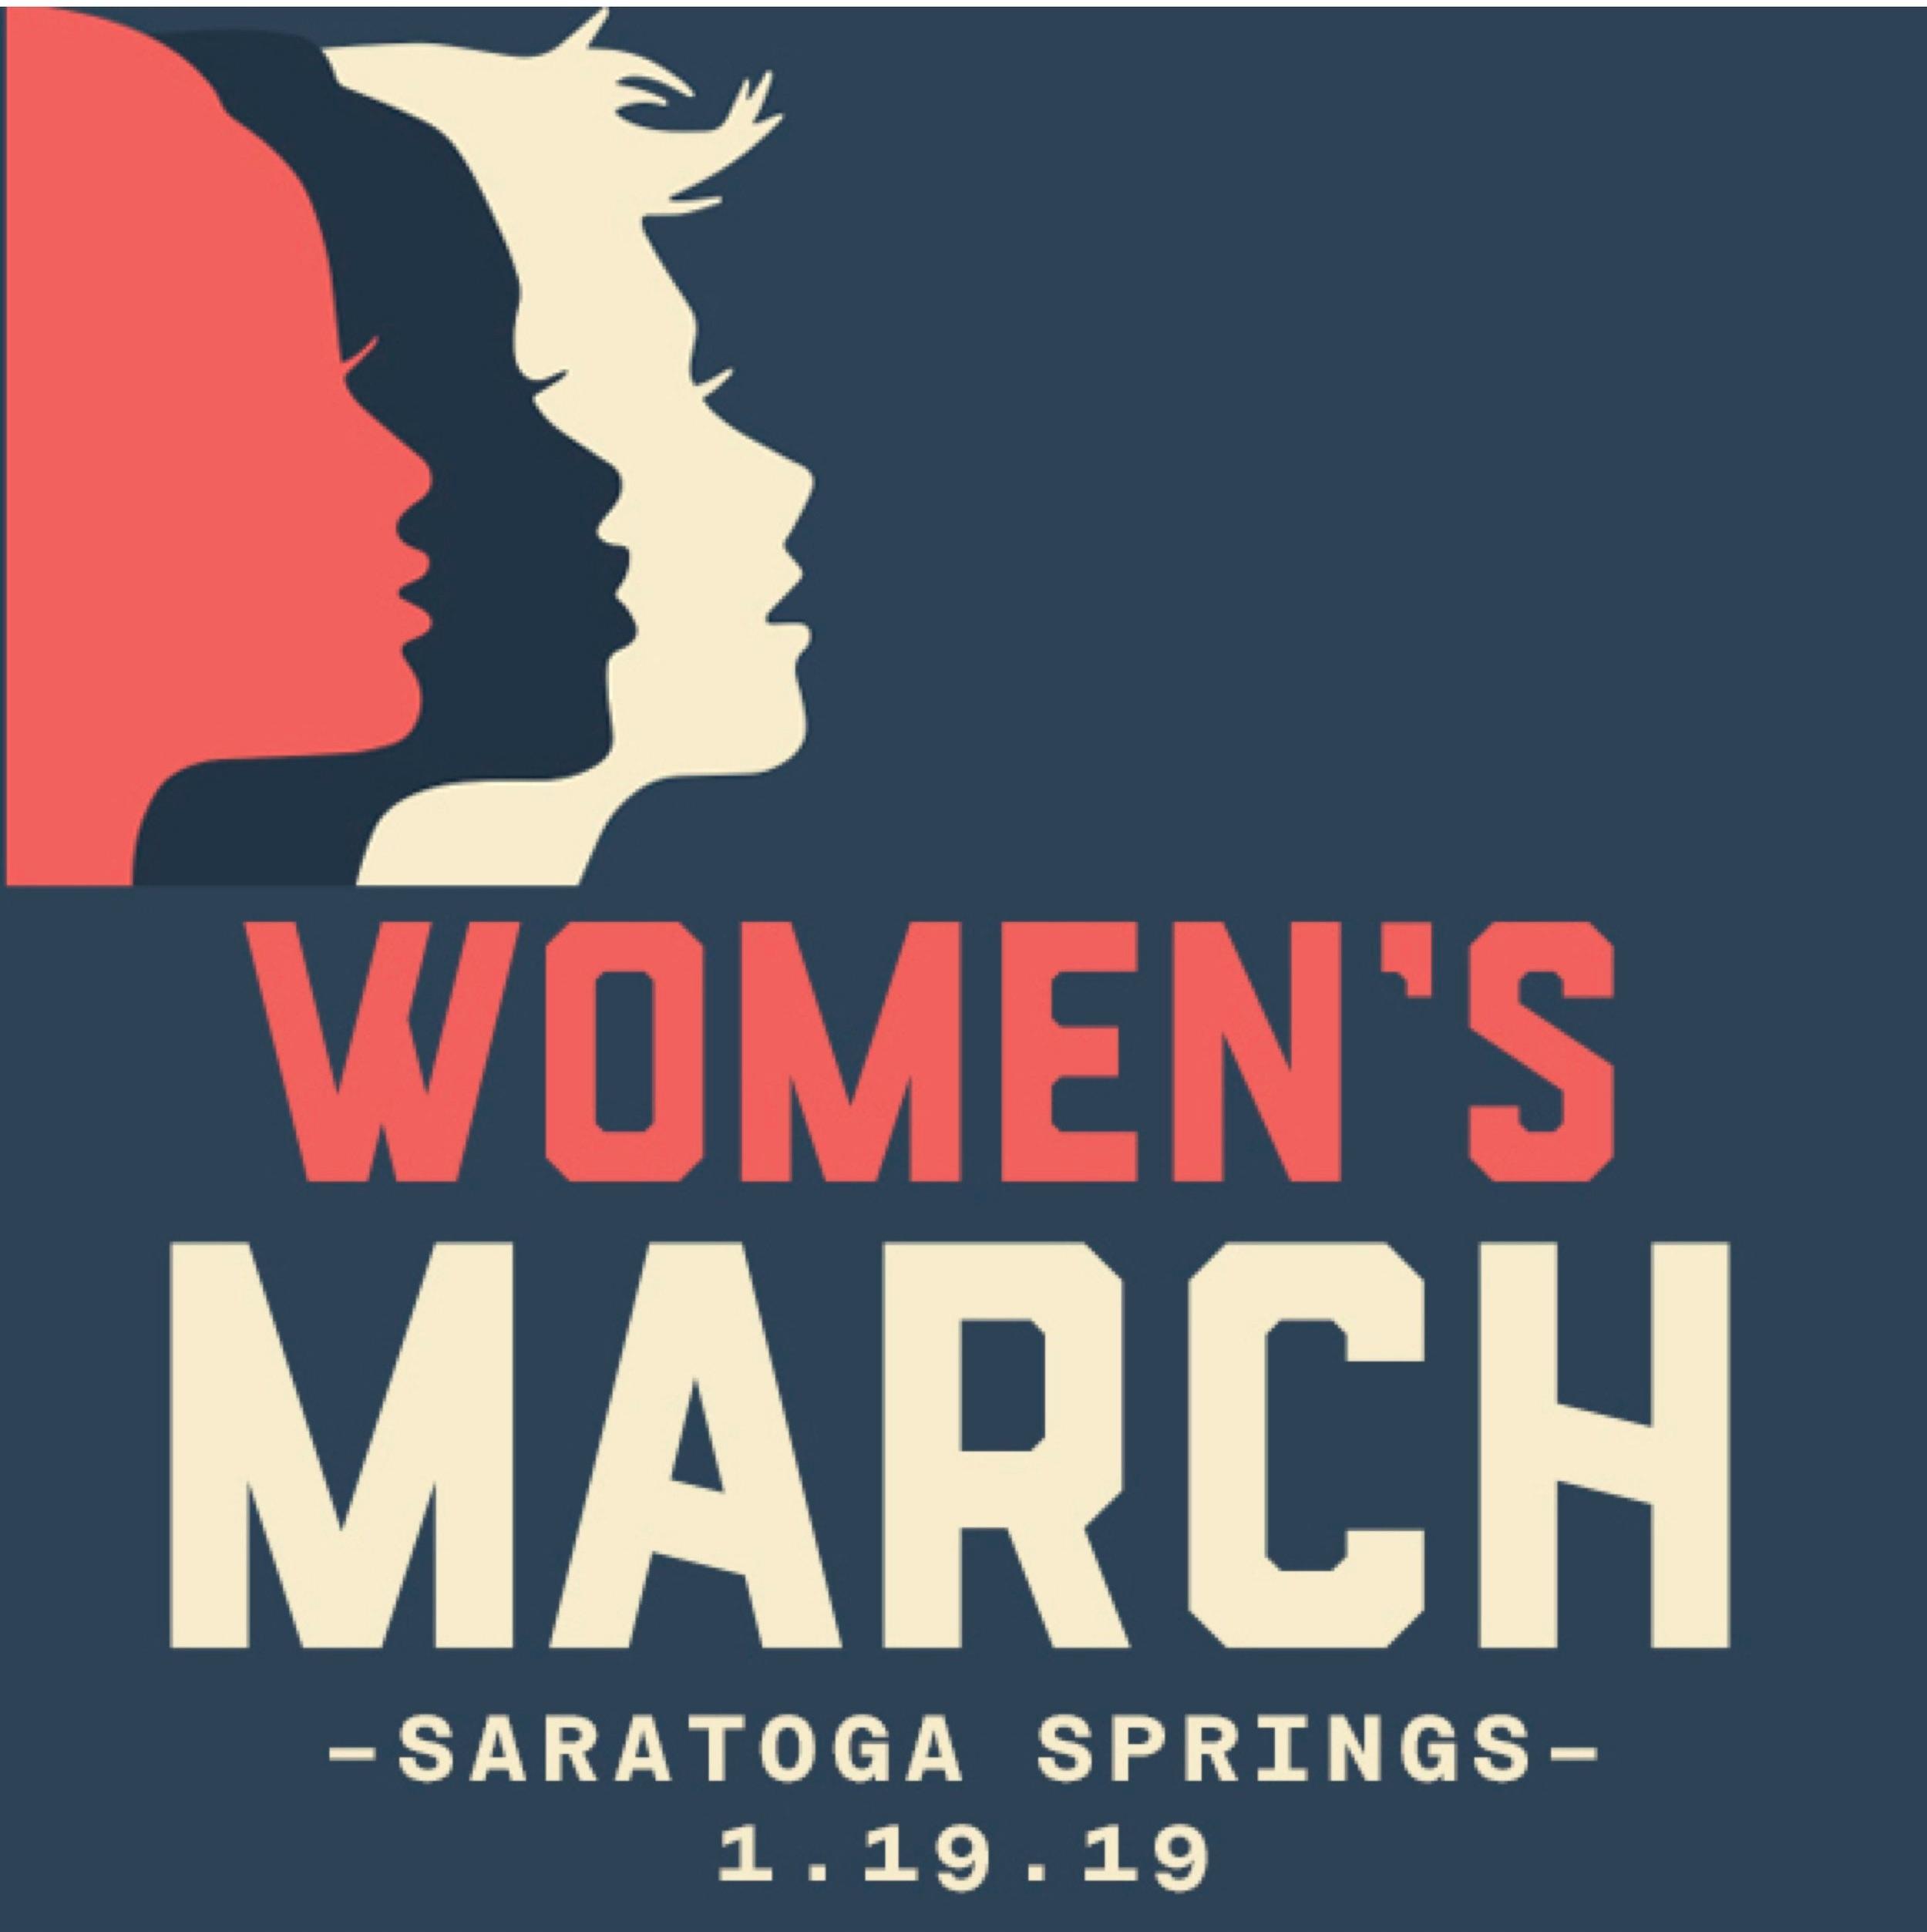 WomensMarchSaratoga_Banner_Sq.jpg